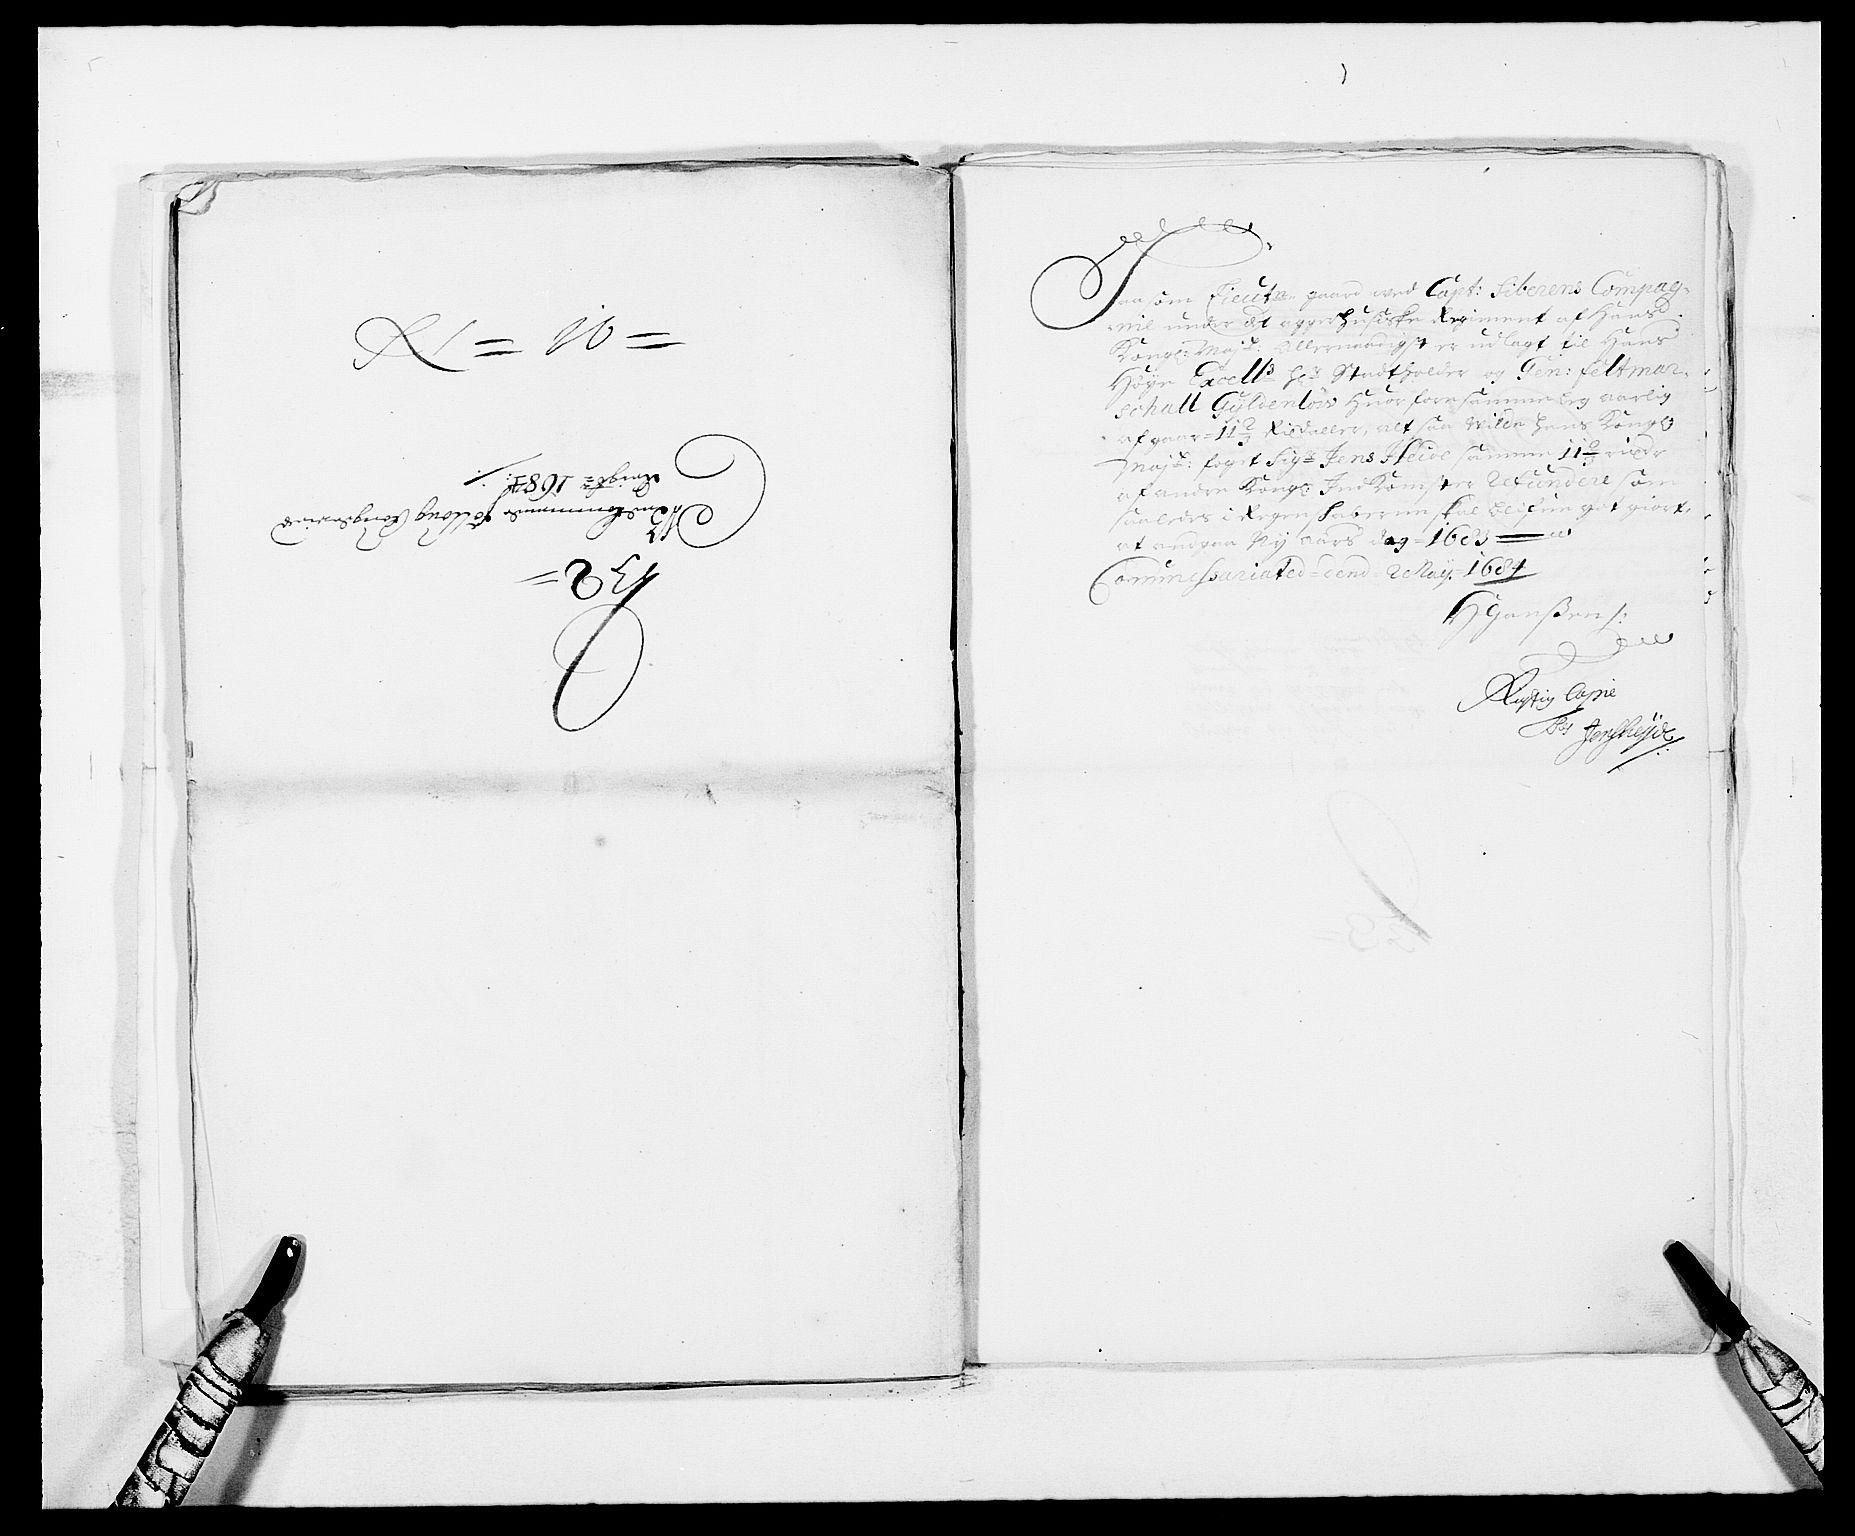 RA, Rentekammeret inntil 1814, Reviderte regnskaper, Fogderegnskap, R09/L0432: Fogderegnskap Follo, 1680-1684, s. 138